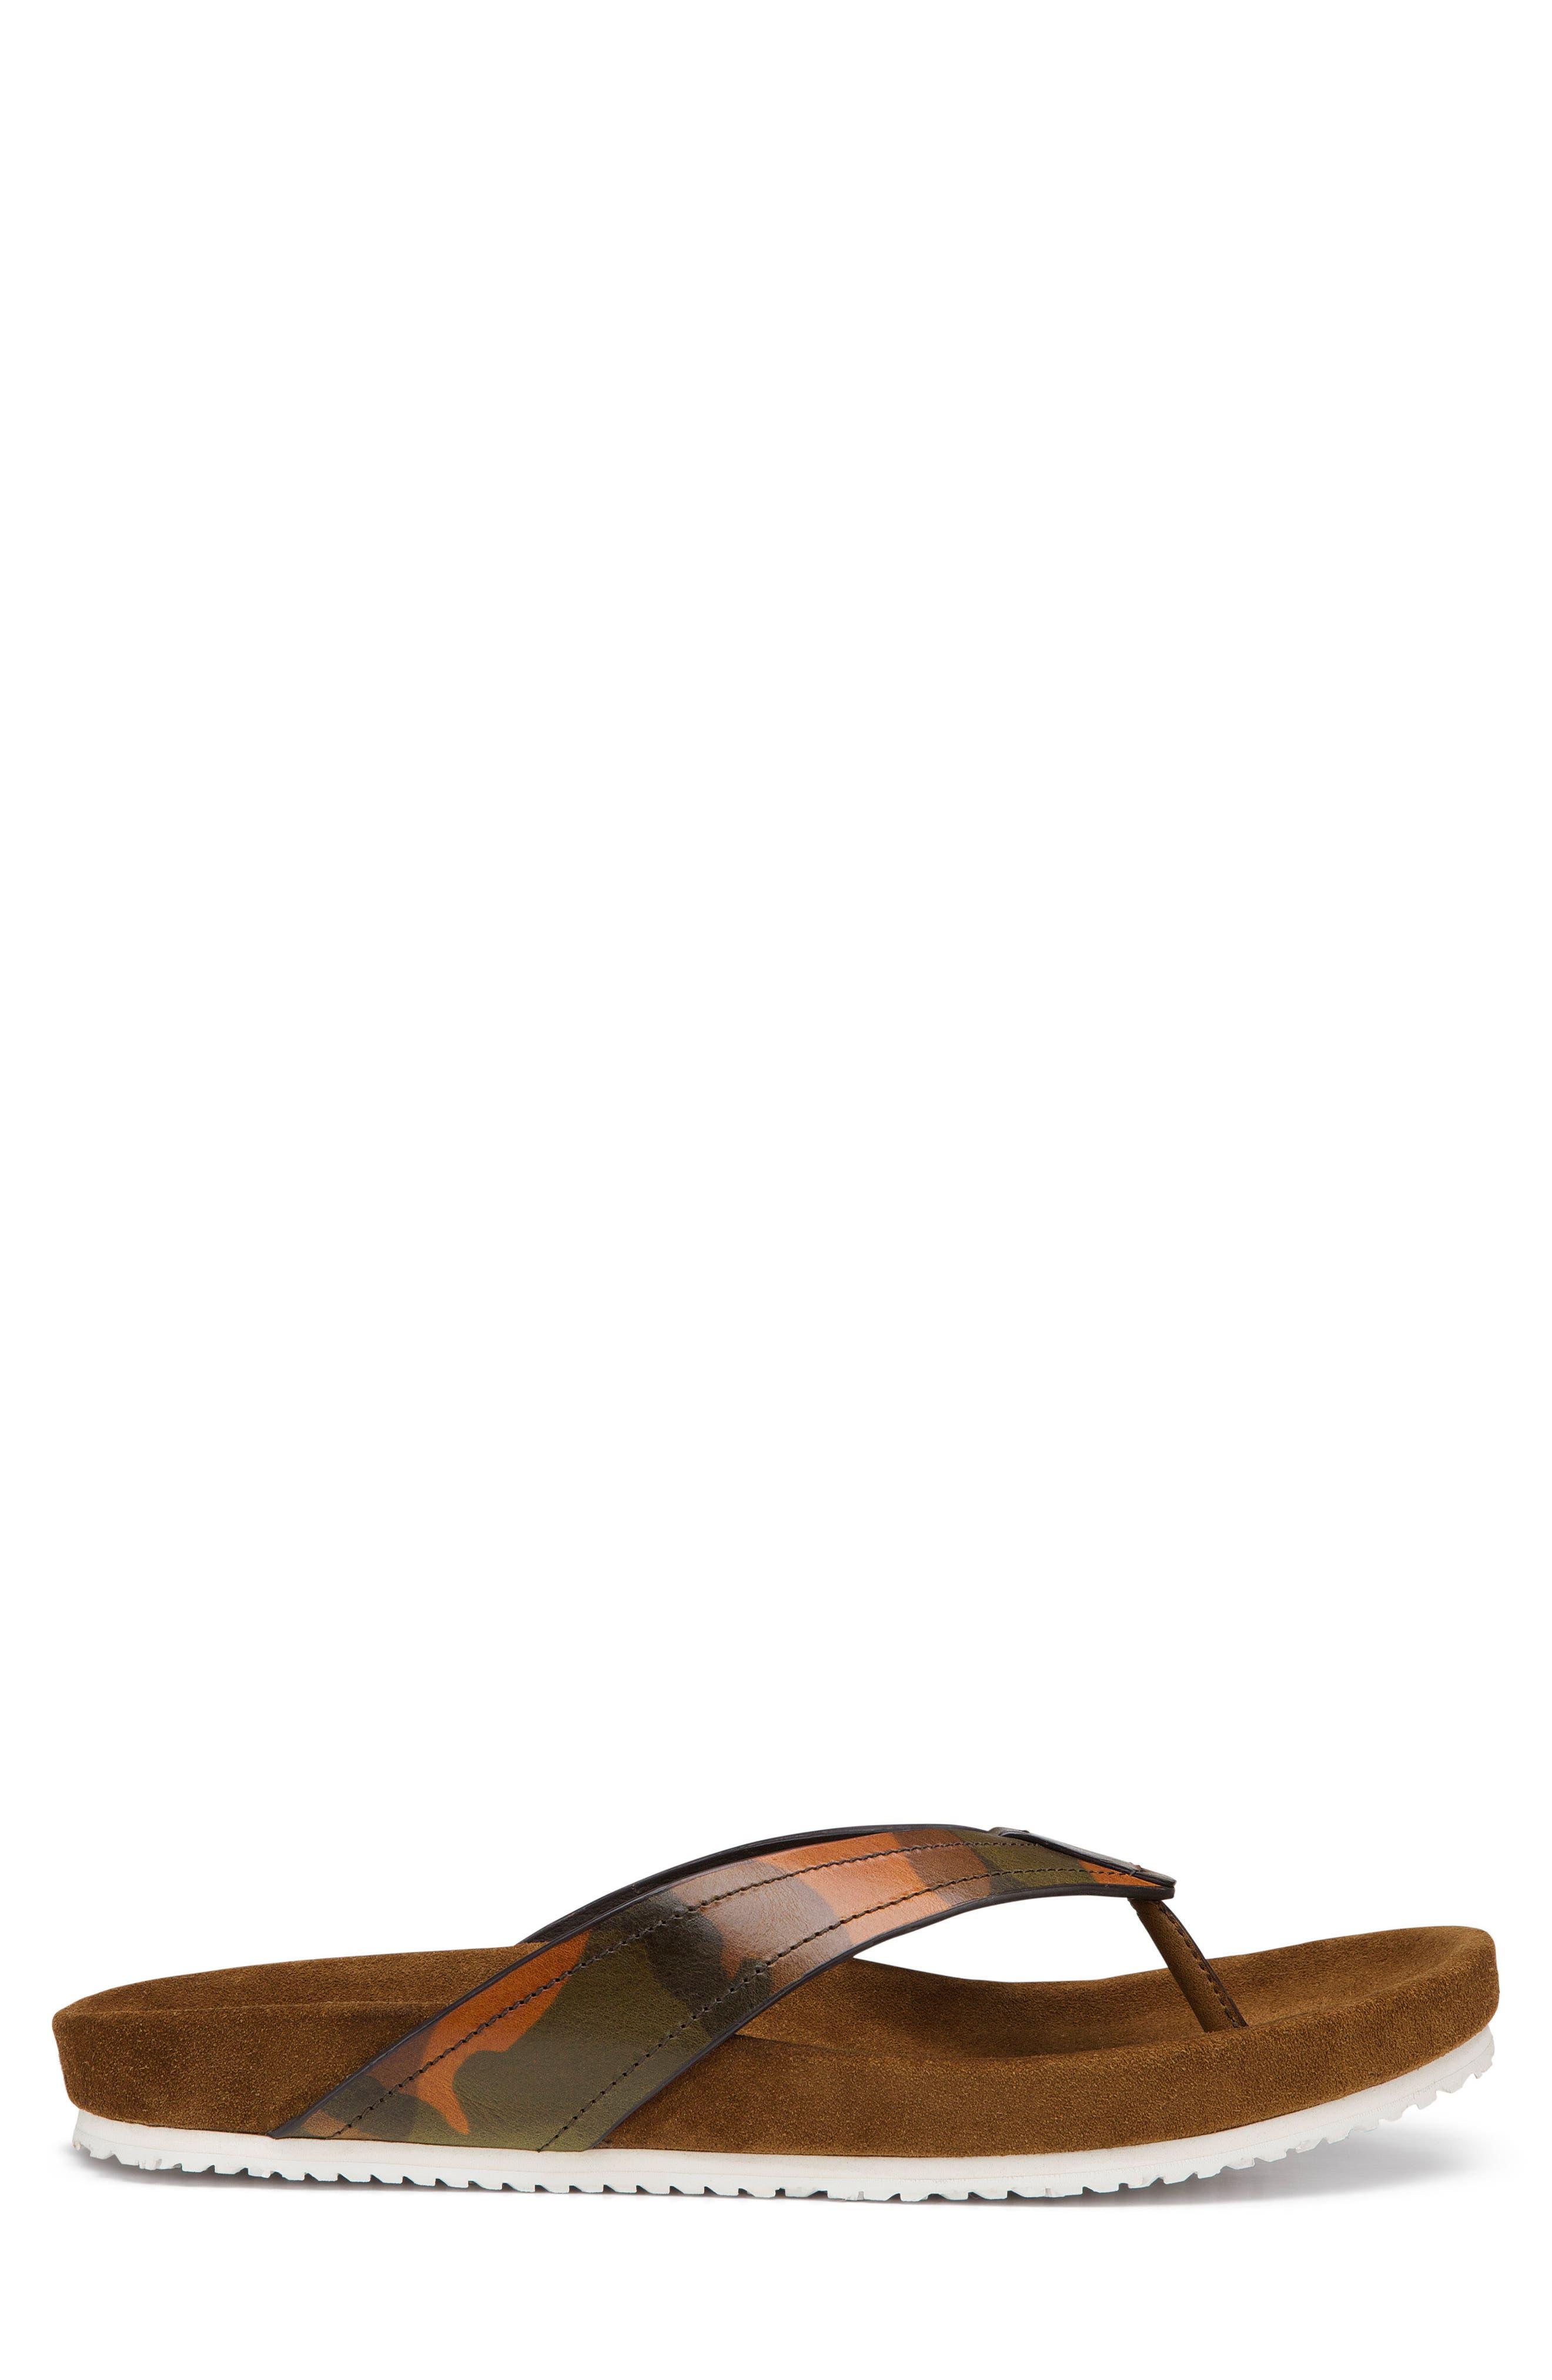 Fleming Flip Flop,                             Alternate thumbnail 3, color,                             Camoflage Leather